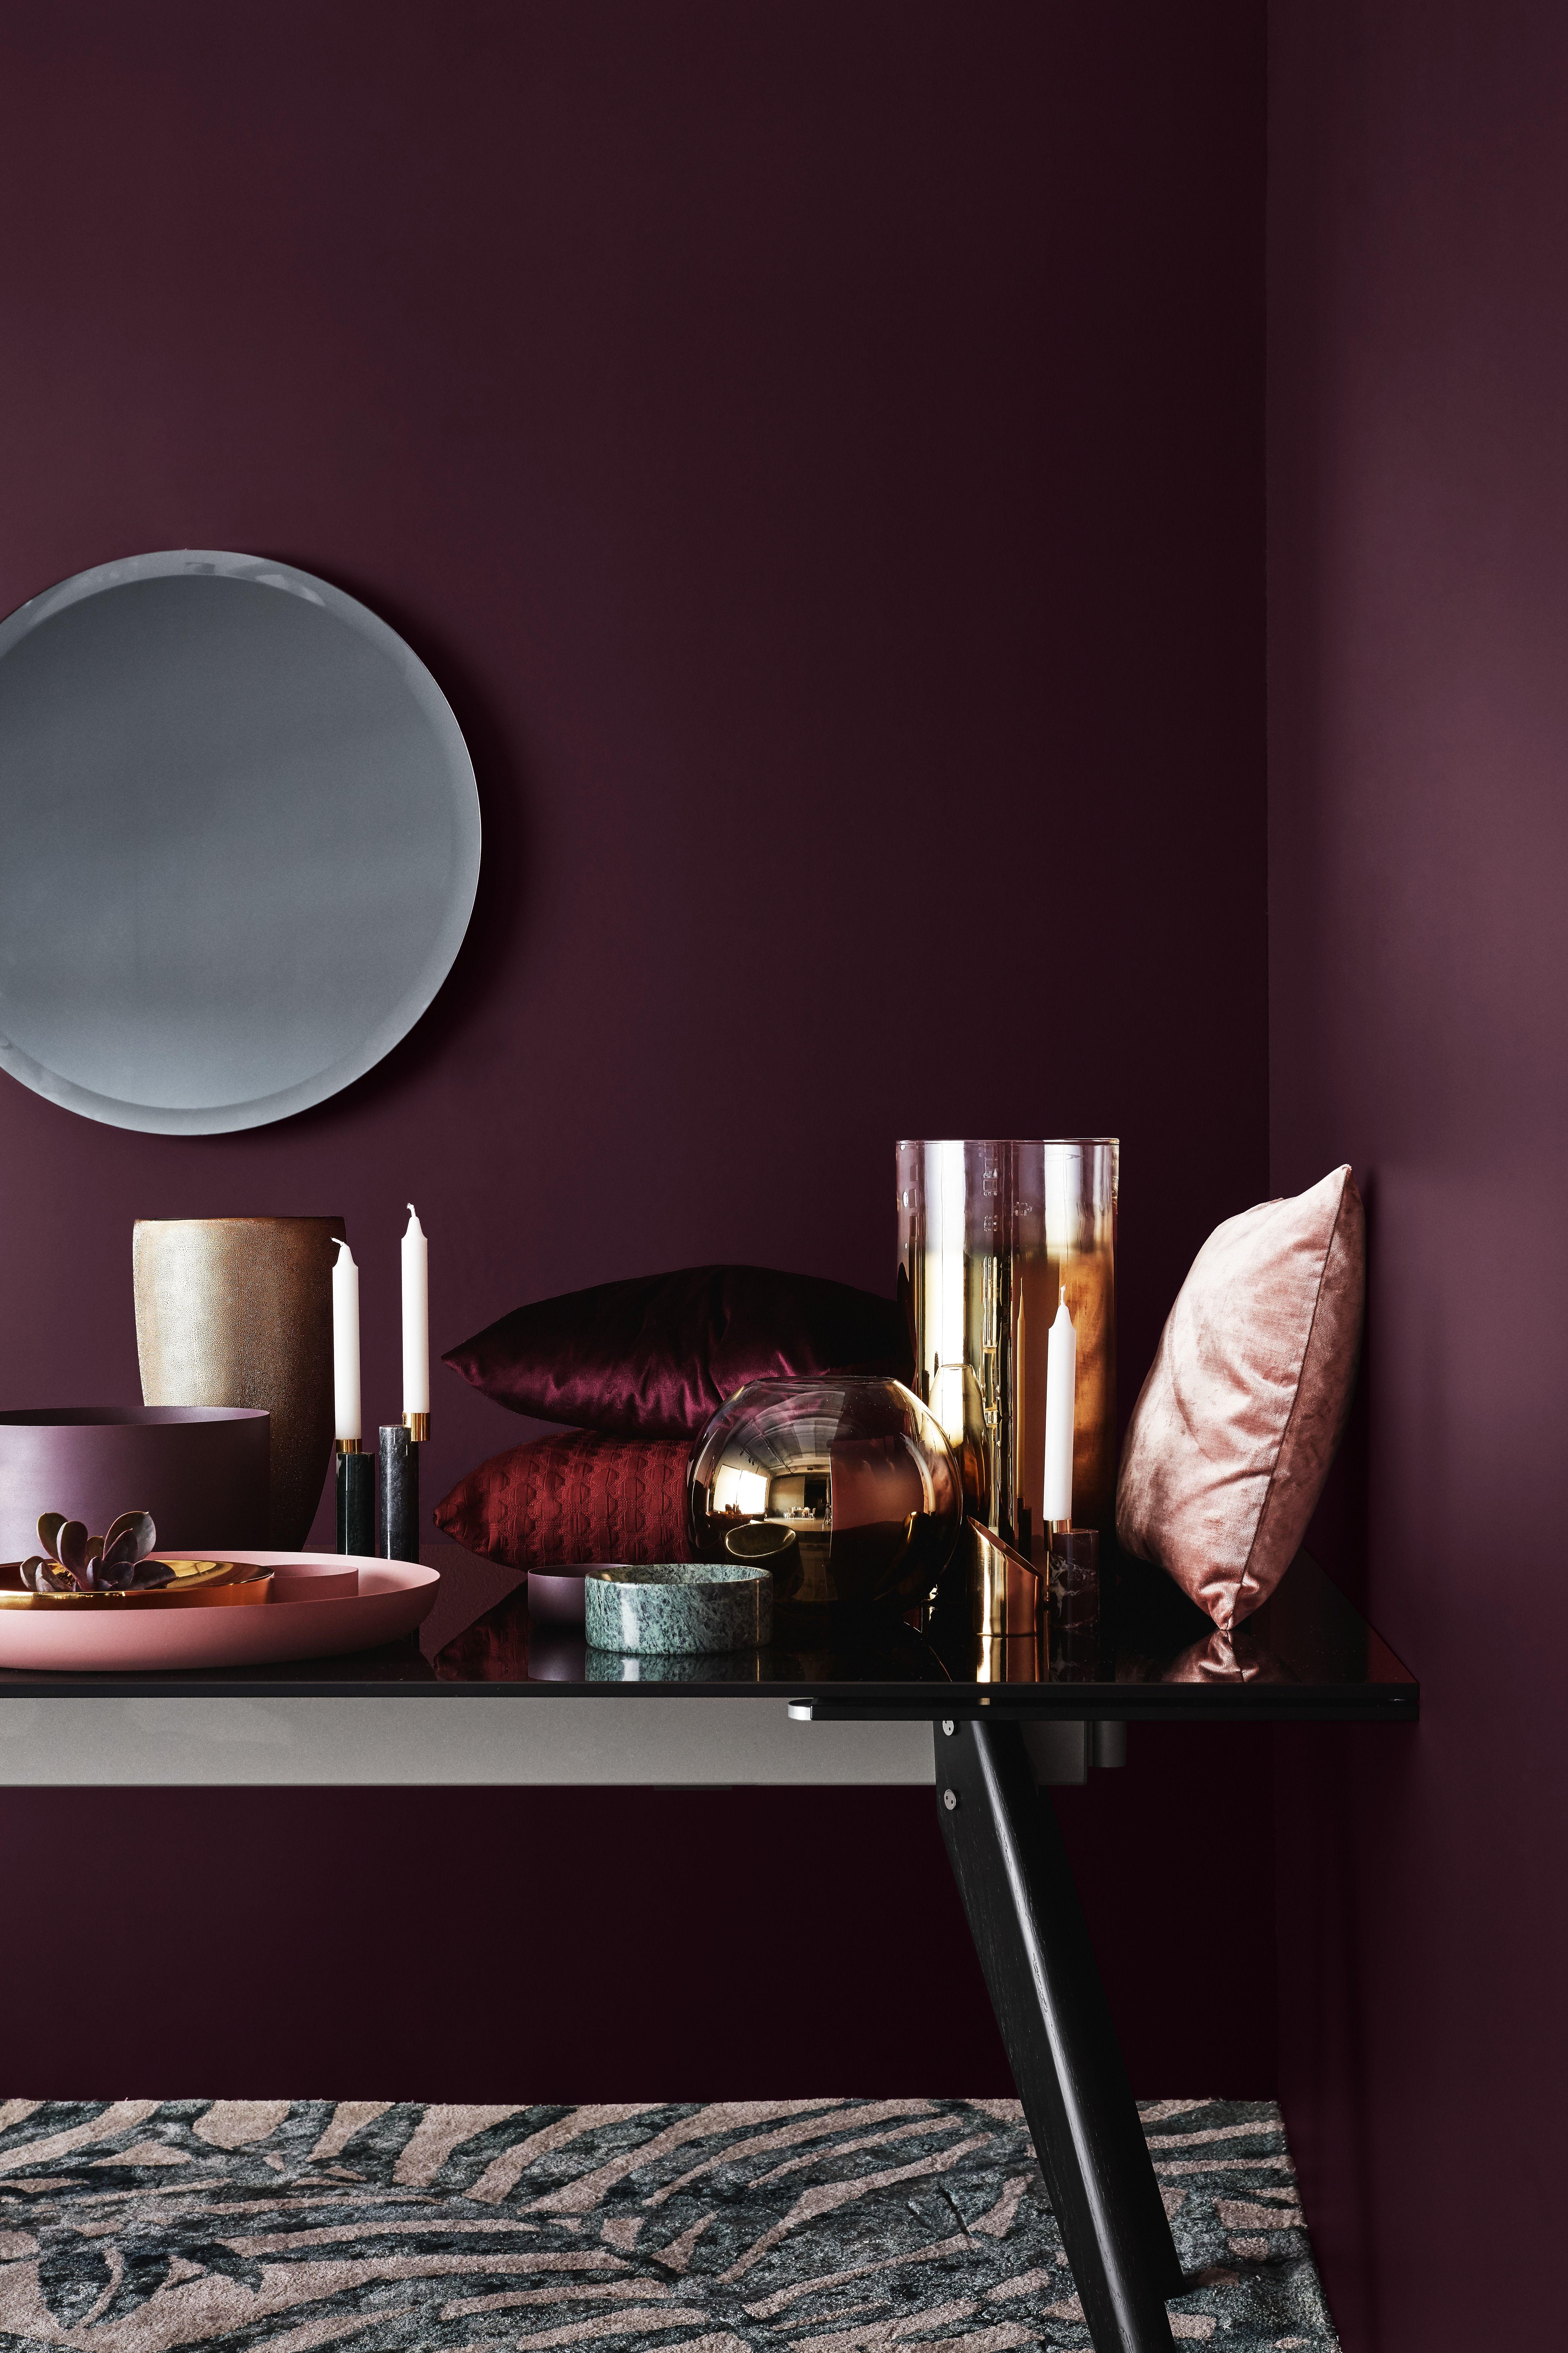 StylingTip interieurAdvies & Ontwerp ♡ - STIJLIDEE | Pinterest ...